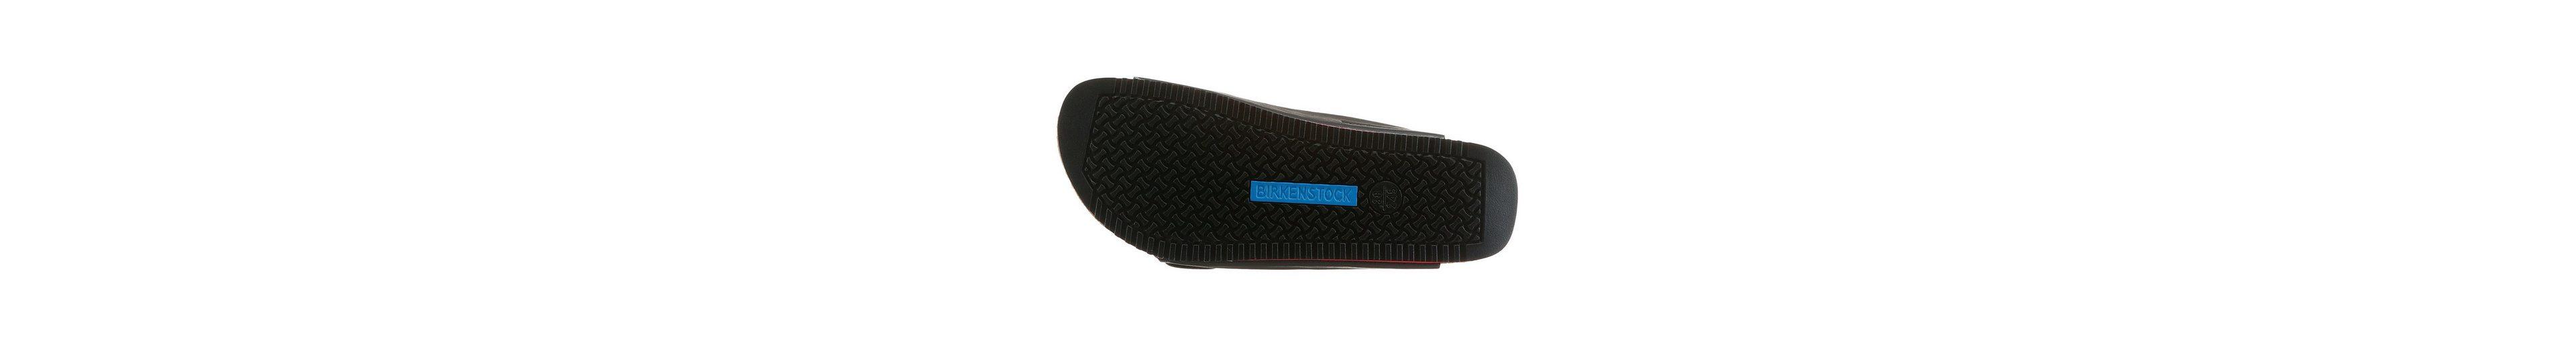 Birkenstock ARIZONA SL Pantolette, mit 2 verstellbaren Riemen